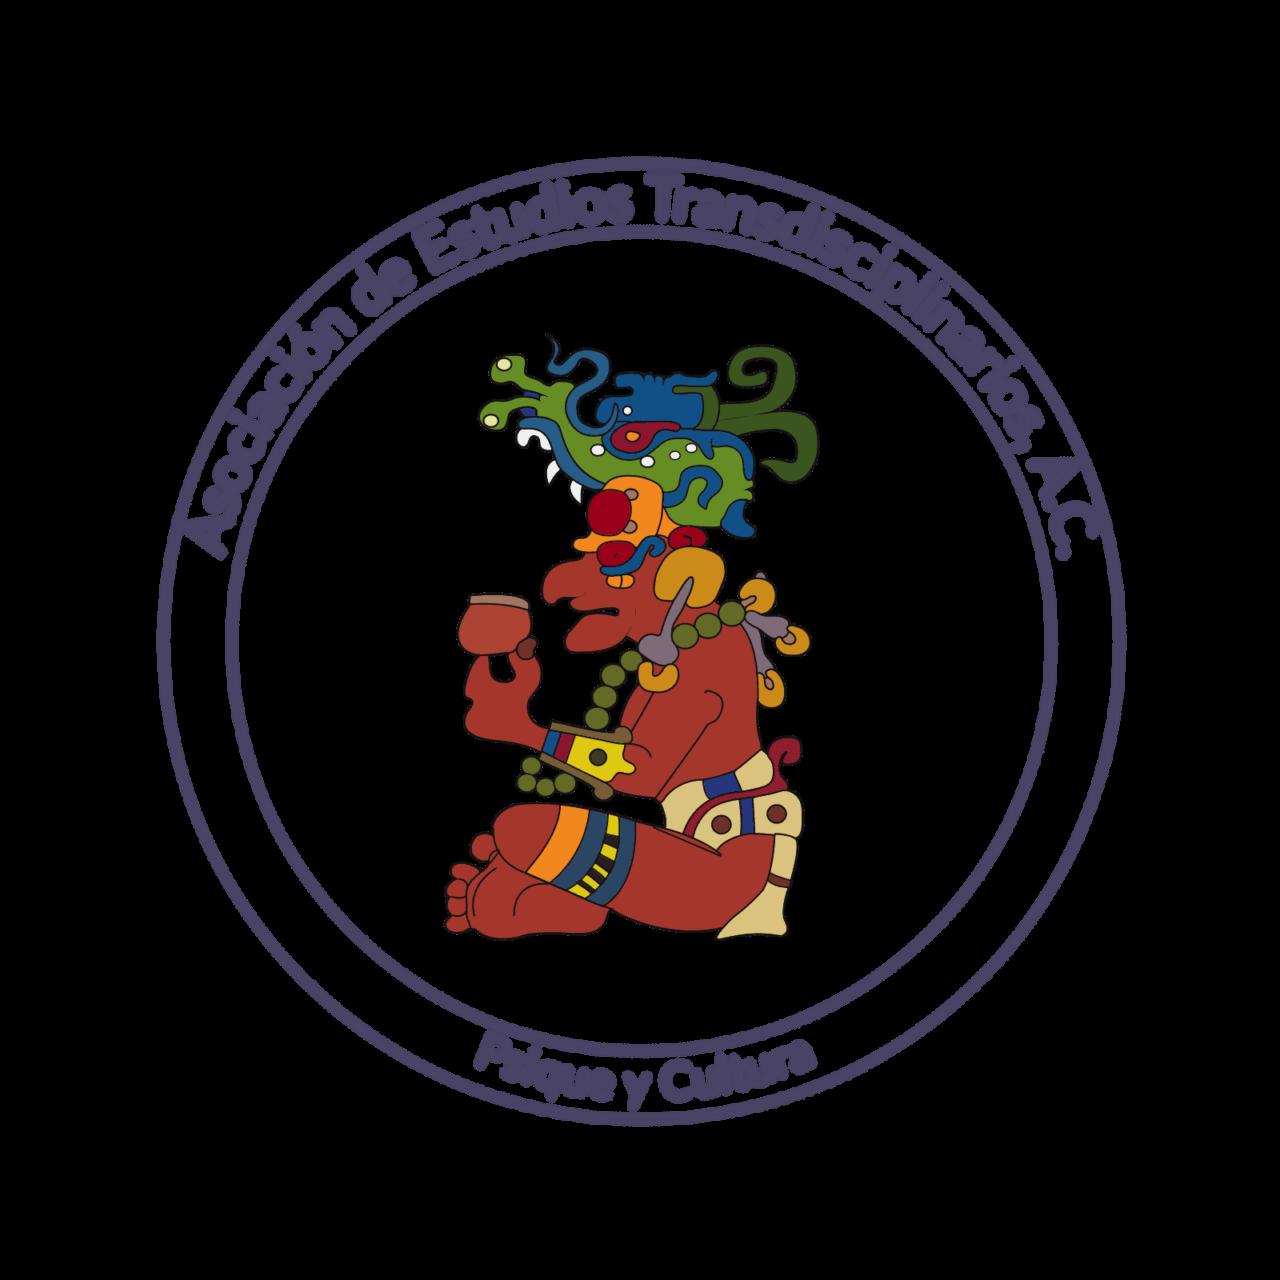 lourdes quiroga icono itzamna 101 1600x1600 c - Dra. Lourdes Quiroga Etienne